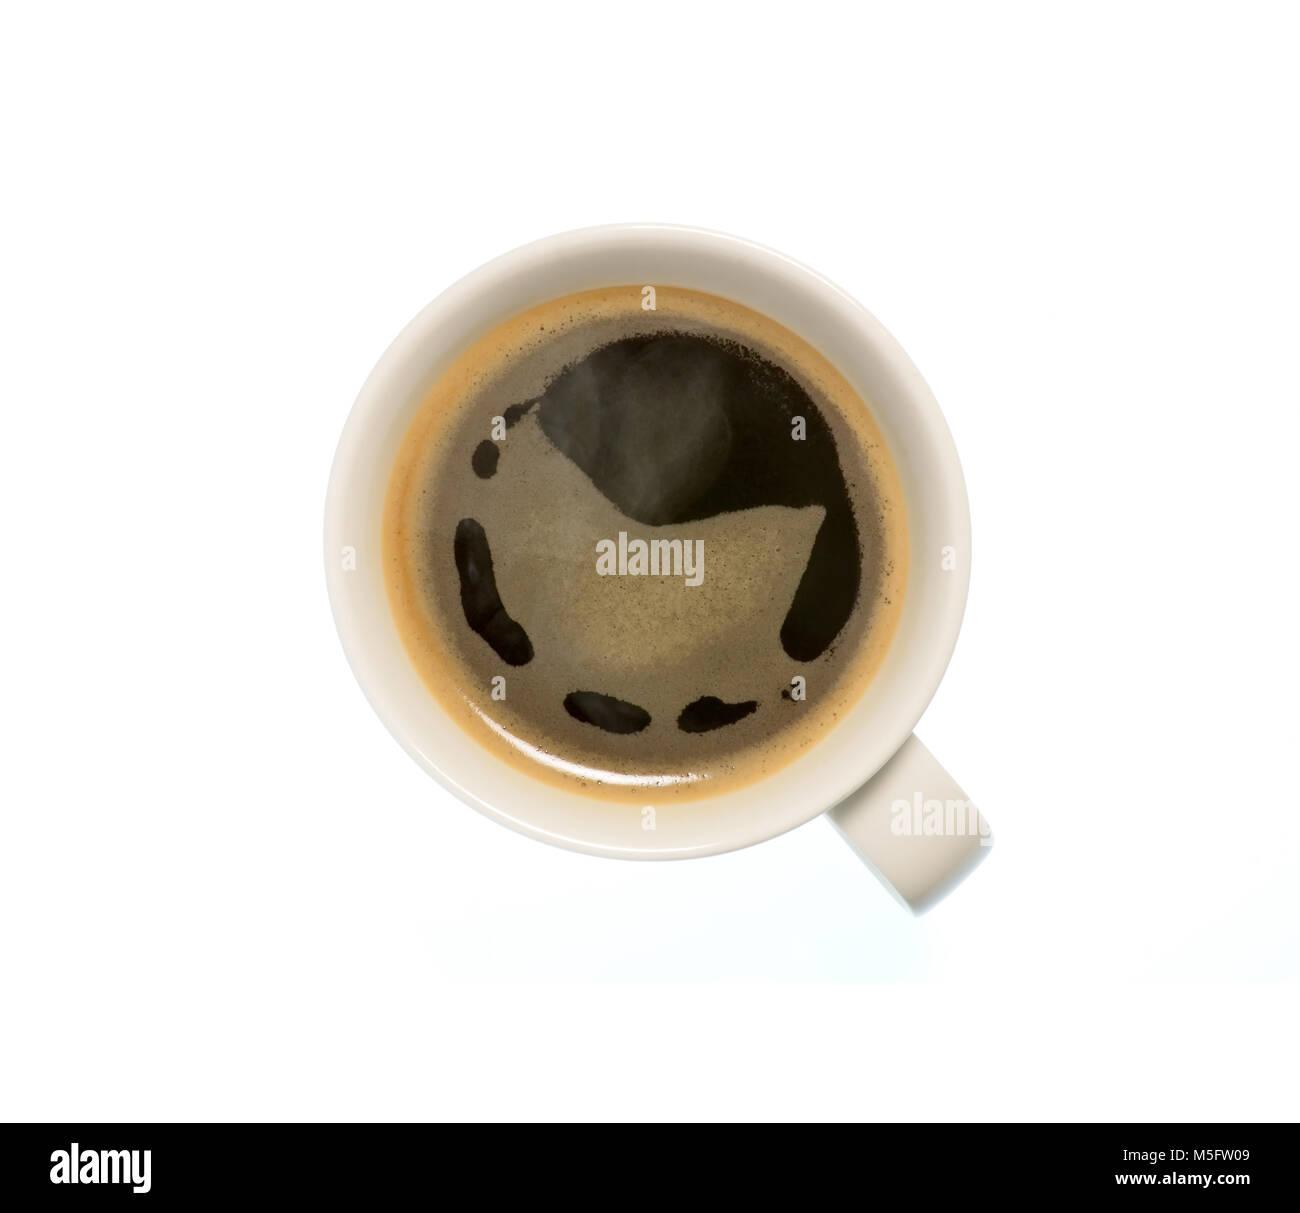 Taza de café aislados, vista superior foto en primer plano de la taza de café negro caliente con vapor Imagen De Stock